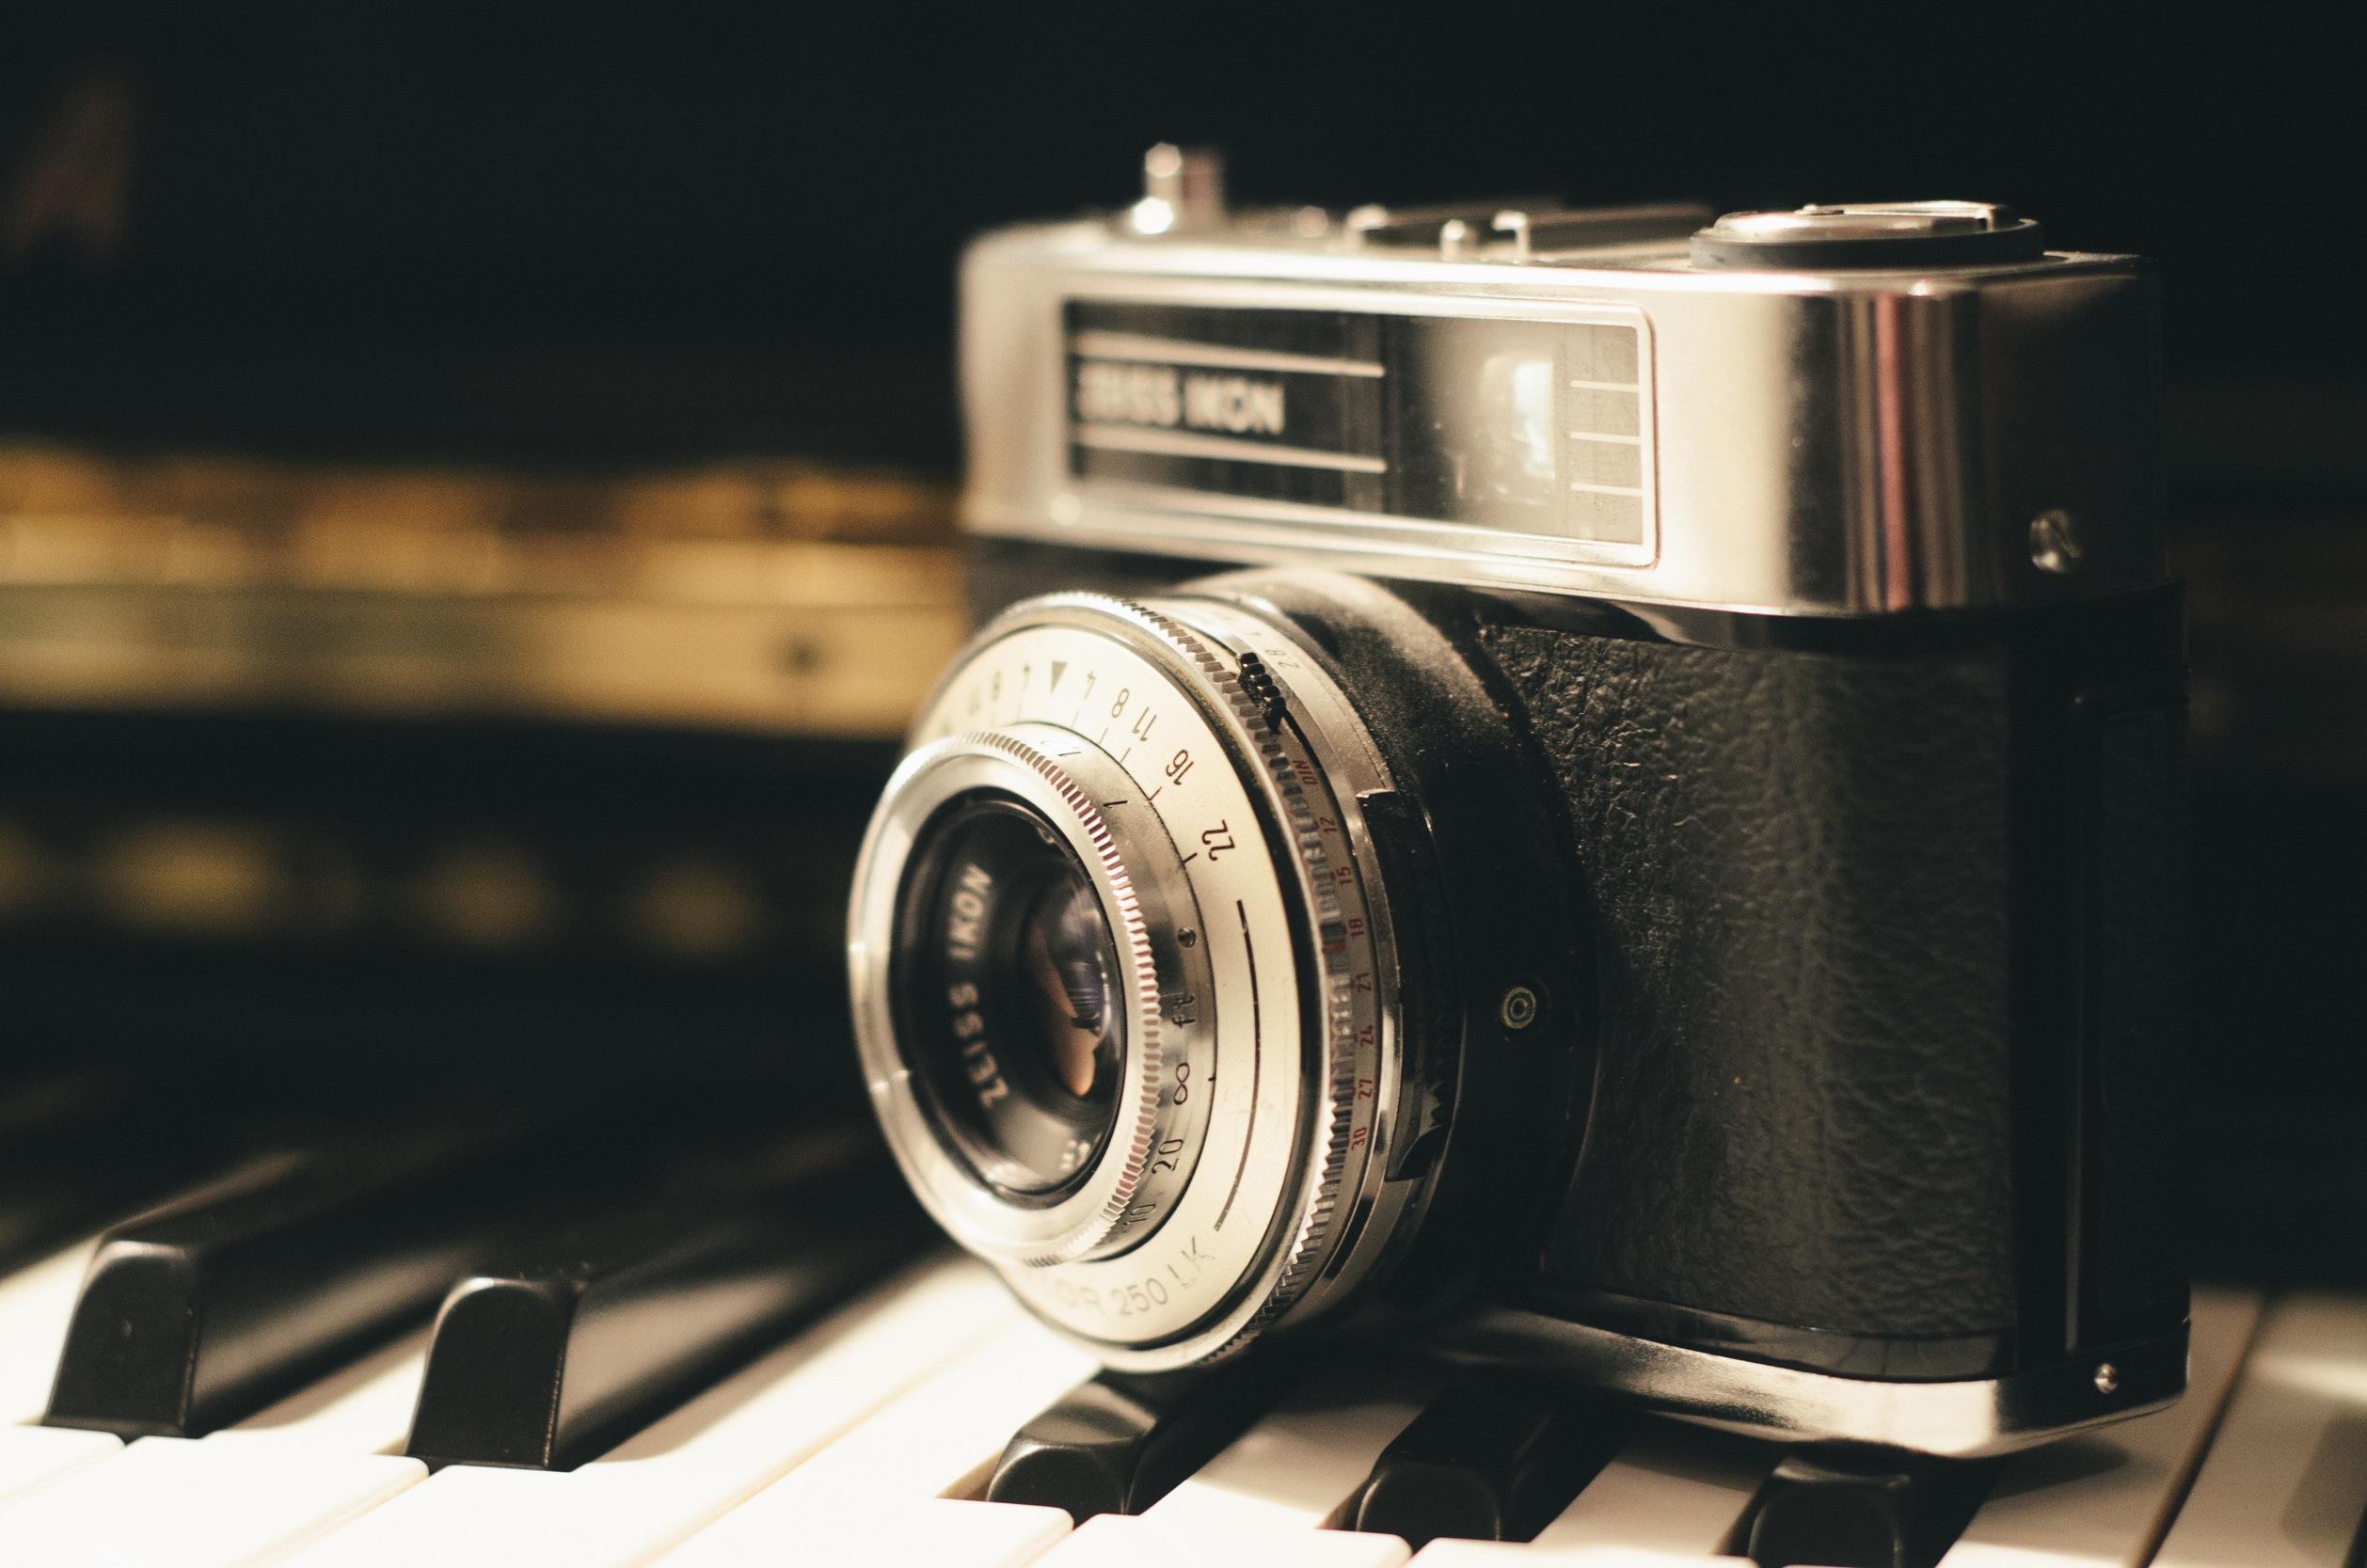 Photograph of 35mm camera on piano keys